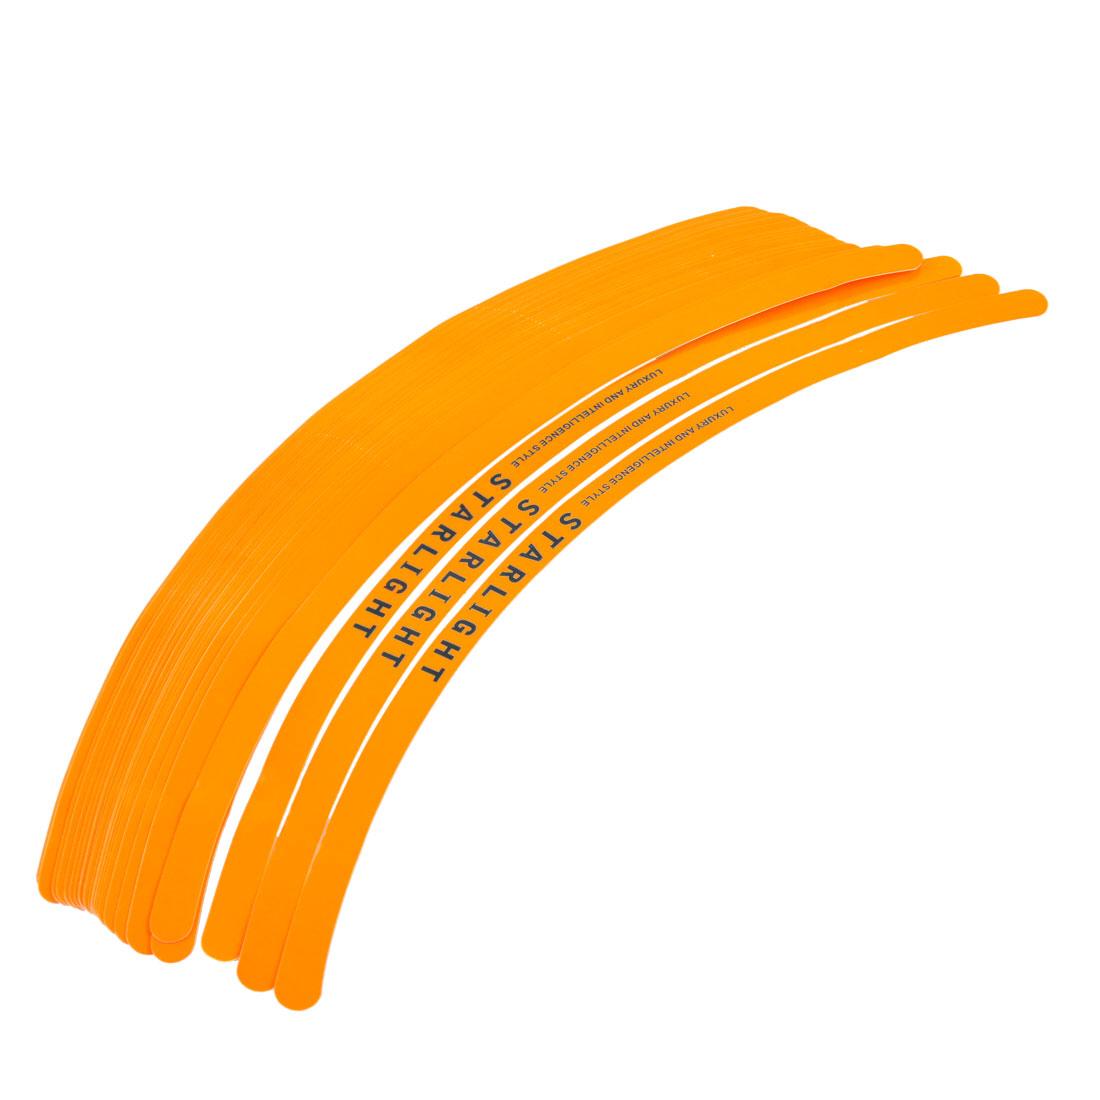 "Car Auto Wheel 11.4"" Long Rim Tape Decorative Stickers Orange 28 Pcs"